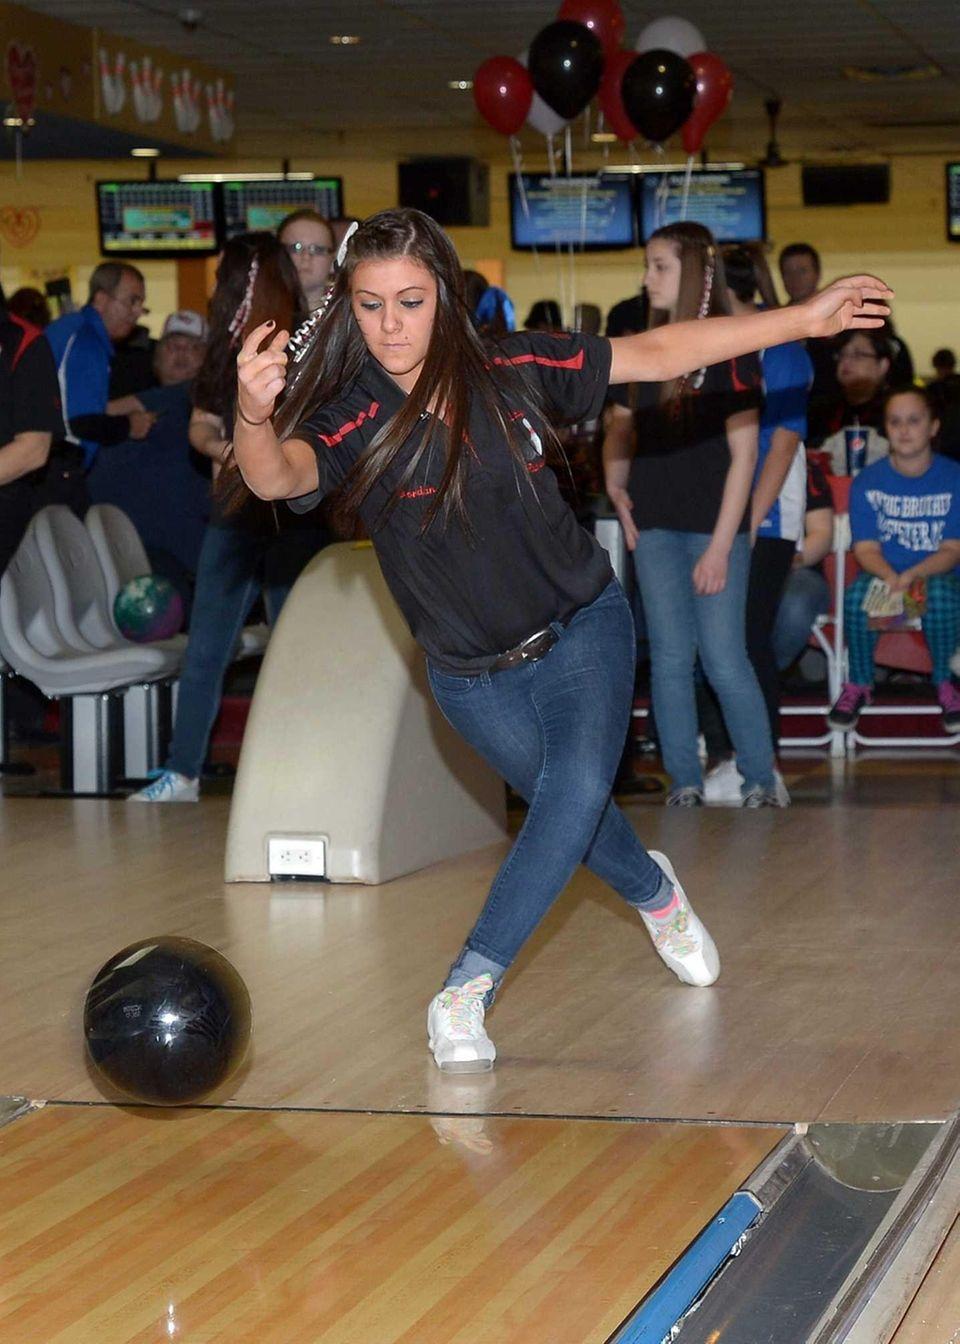 East Islip's Jordan Kruger releases the ball during